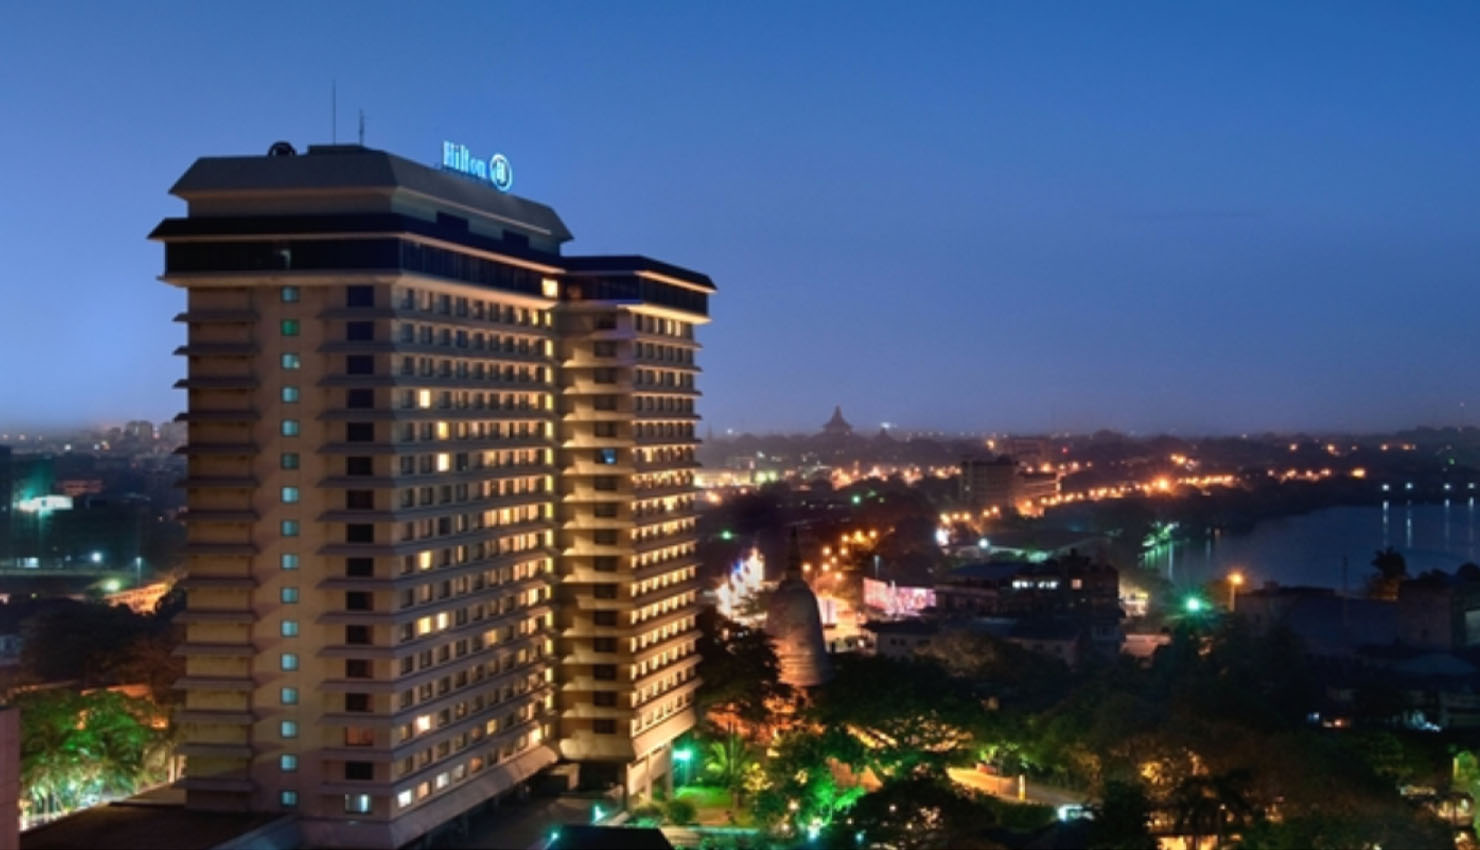 Hilton Hotel, Sri Lanka